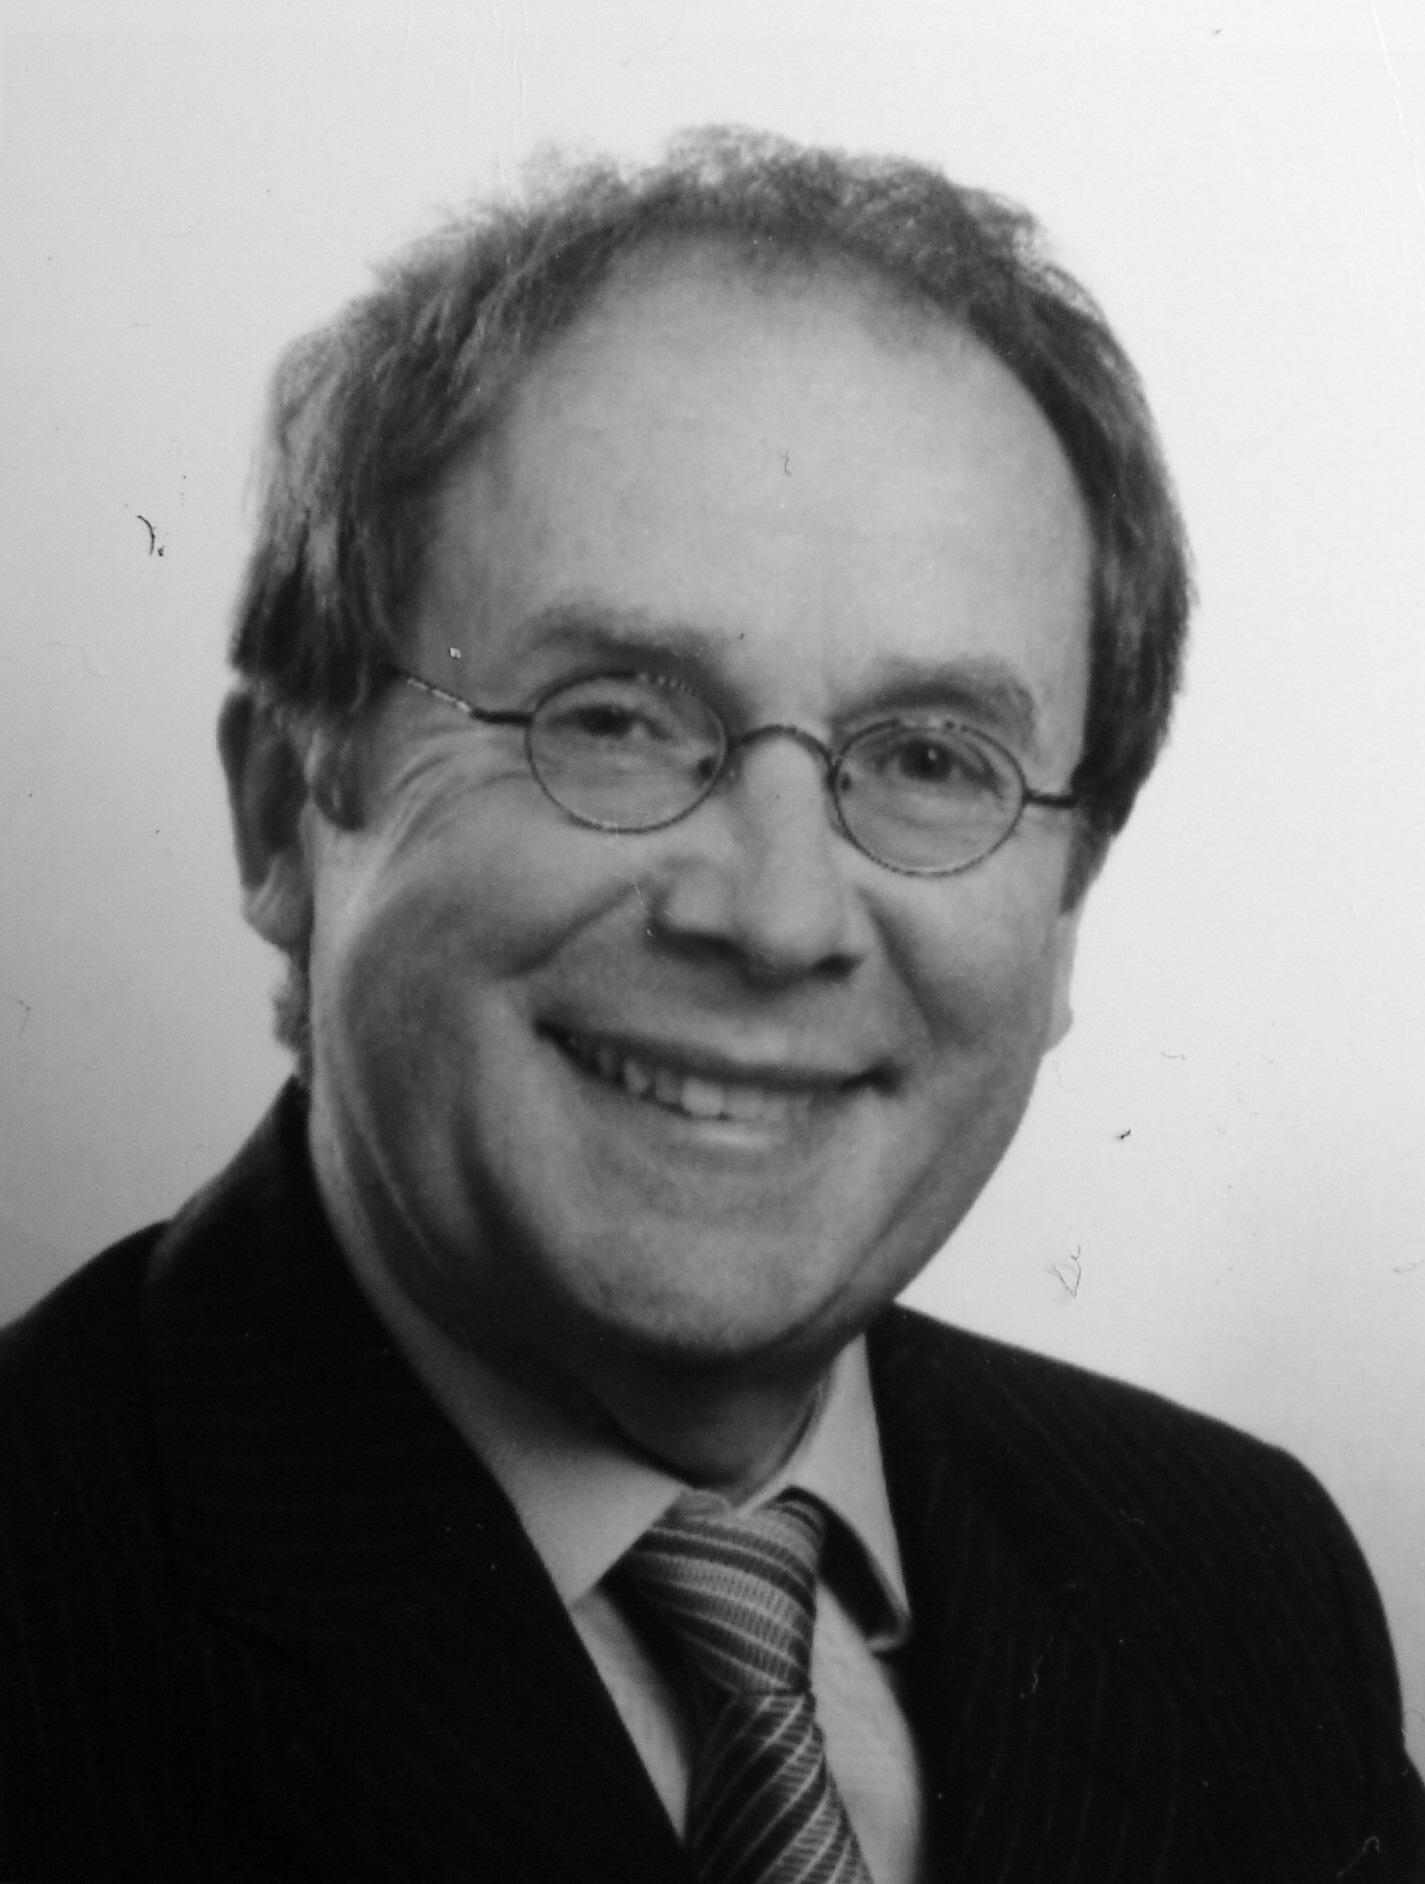 Klaus Spitz